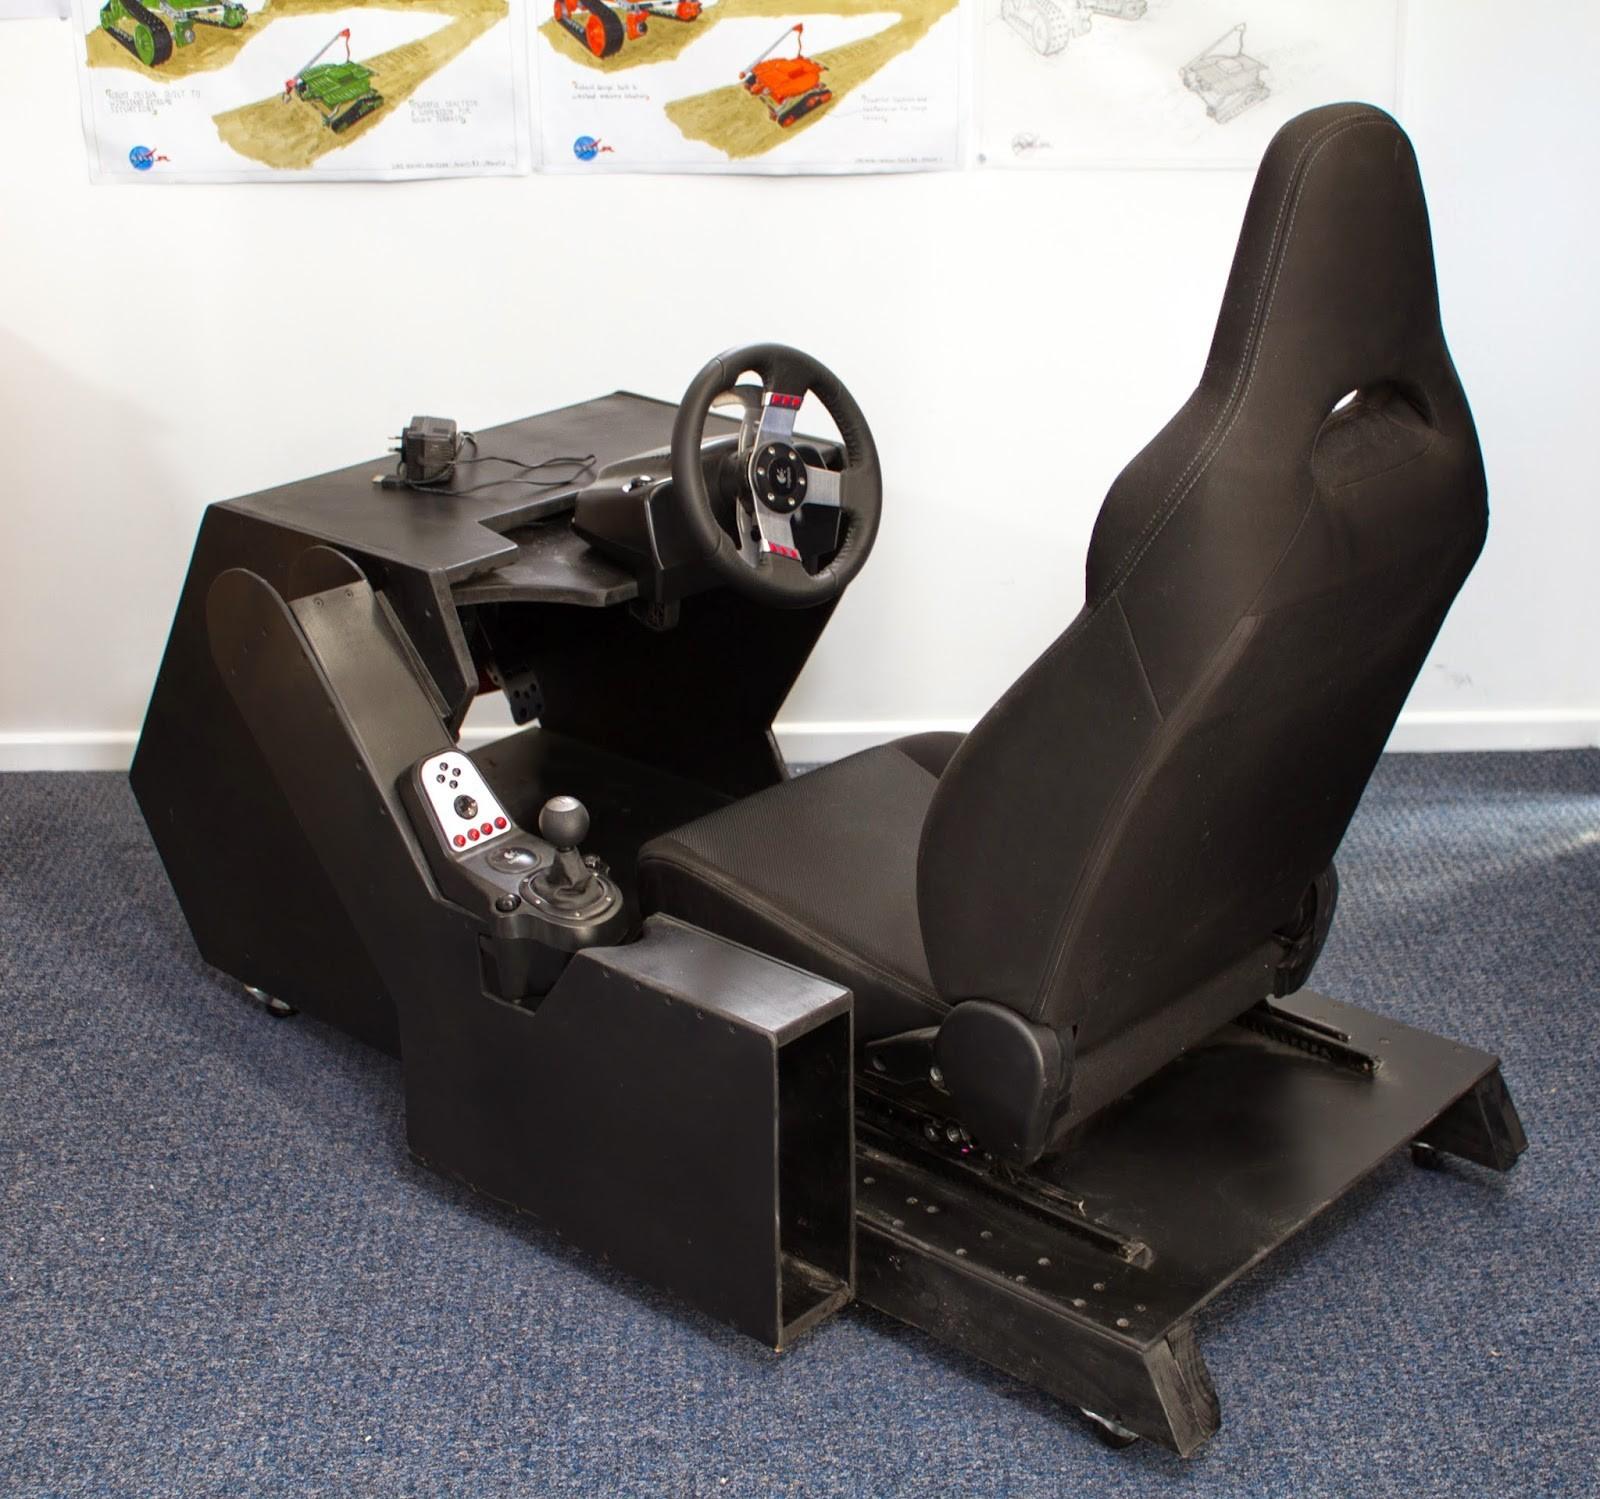 Pencil Warriors - Racing Cockpit Simulator